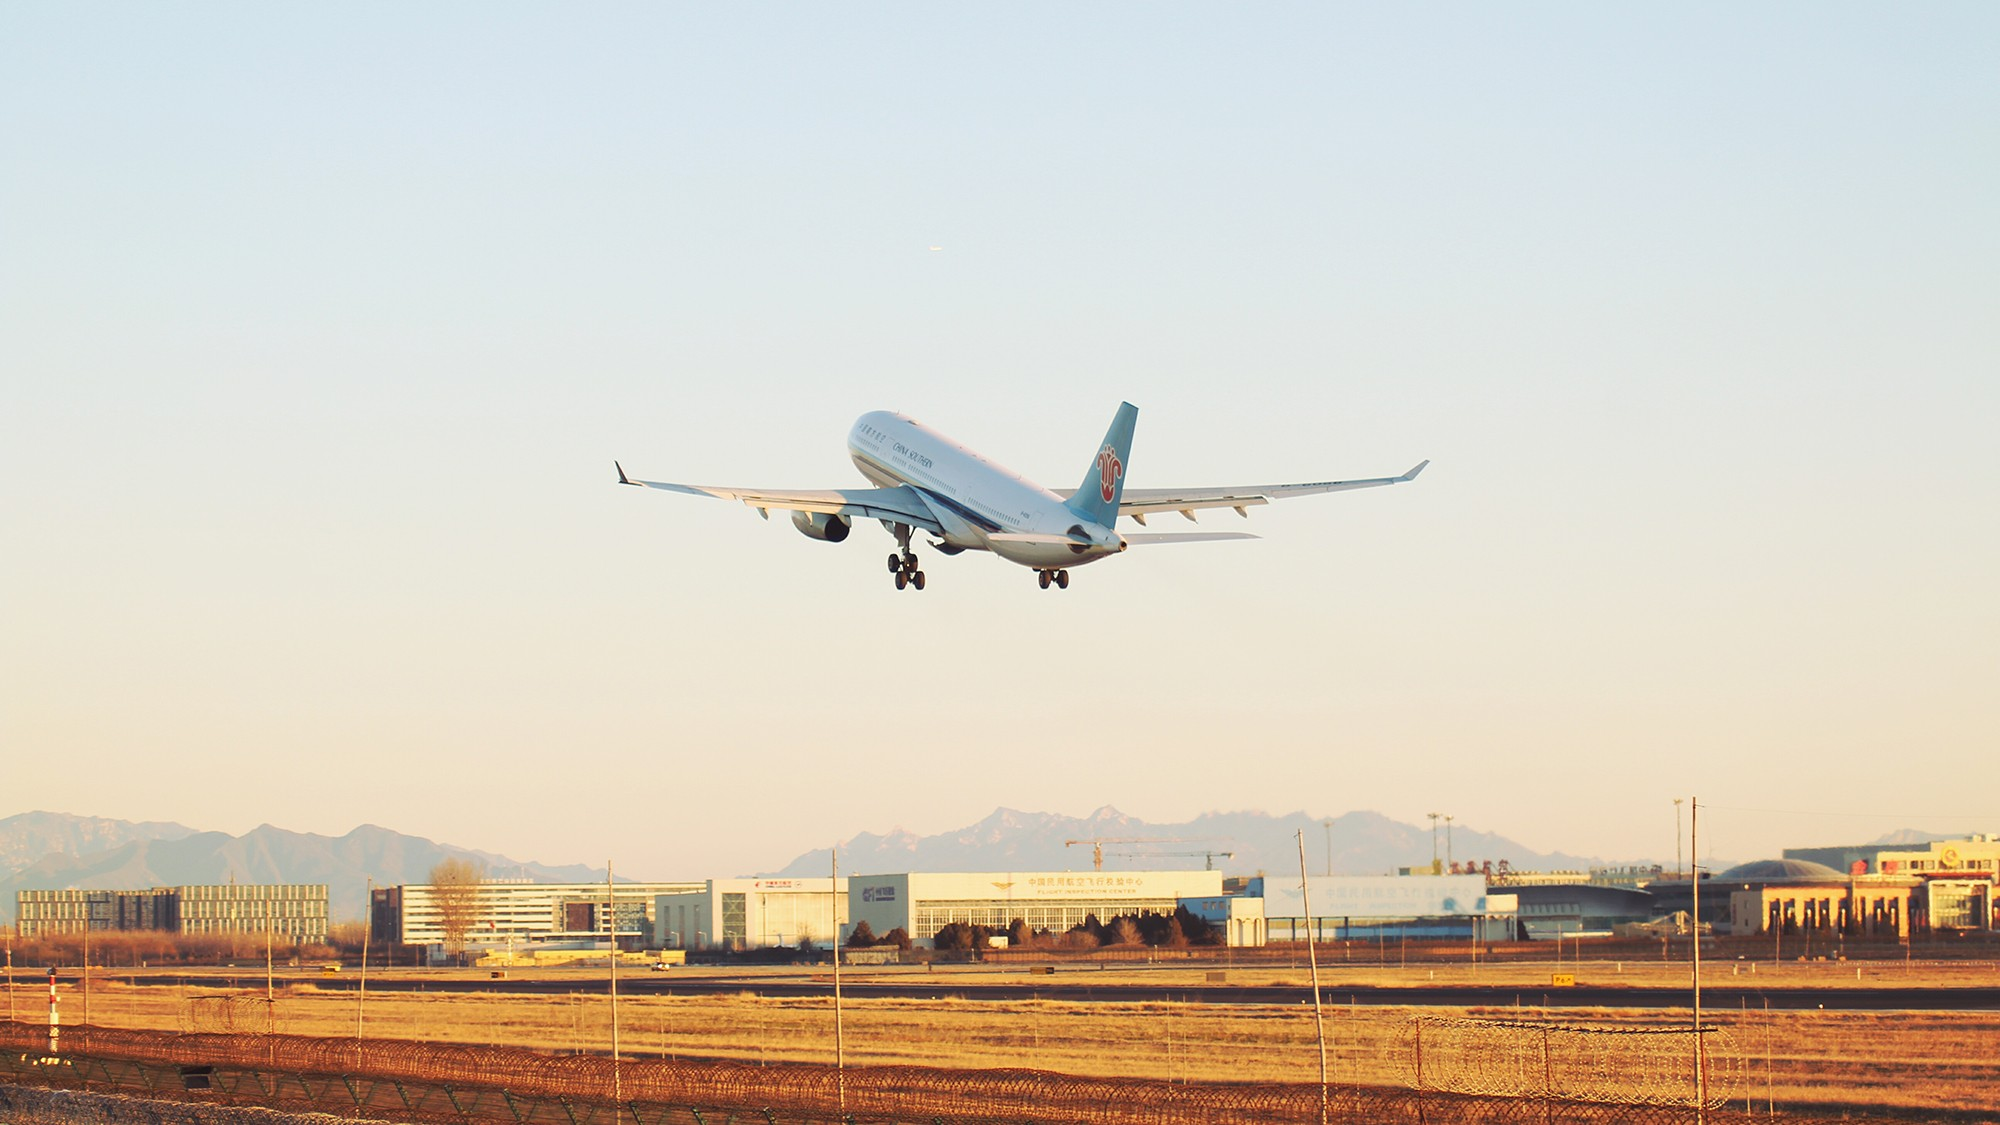 Re:[原创]河北人为拍机而首都机场2日游虽常规但值得纪念(36L) AIRBUS A330-200 B-6056 首都机场